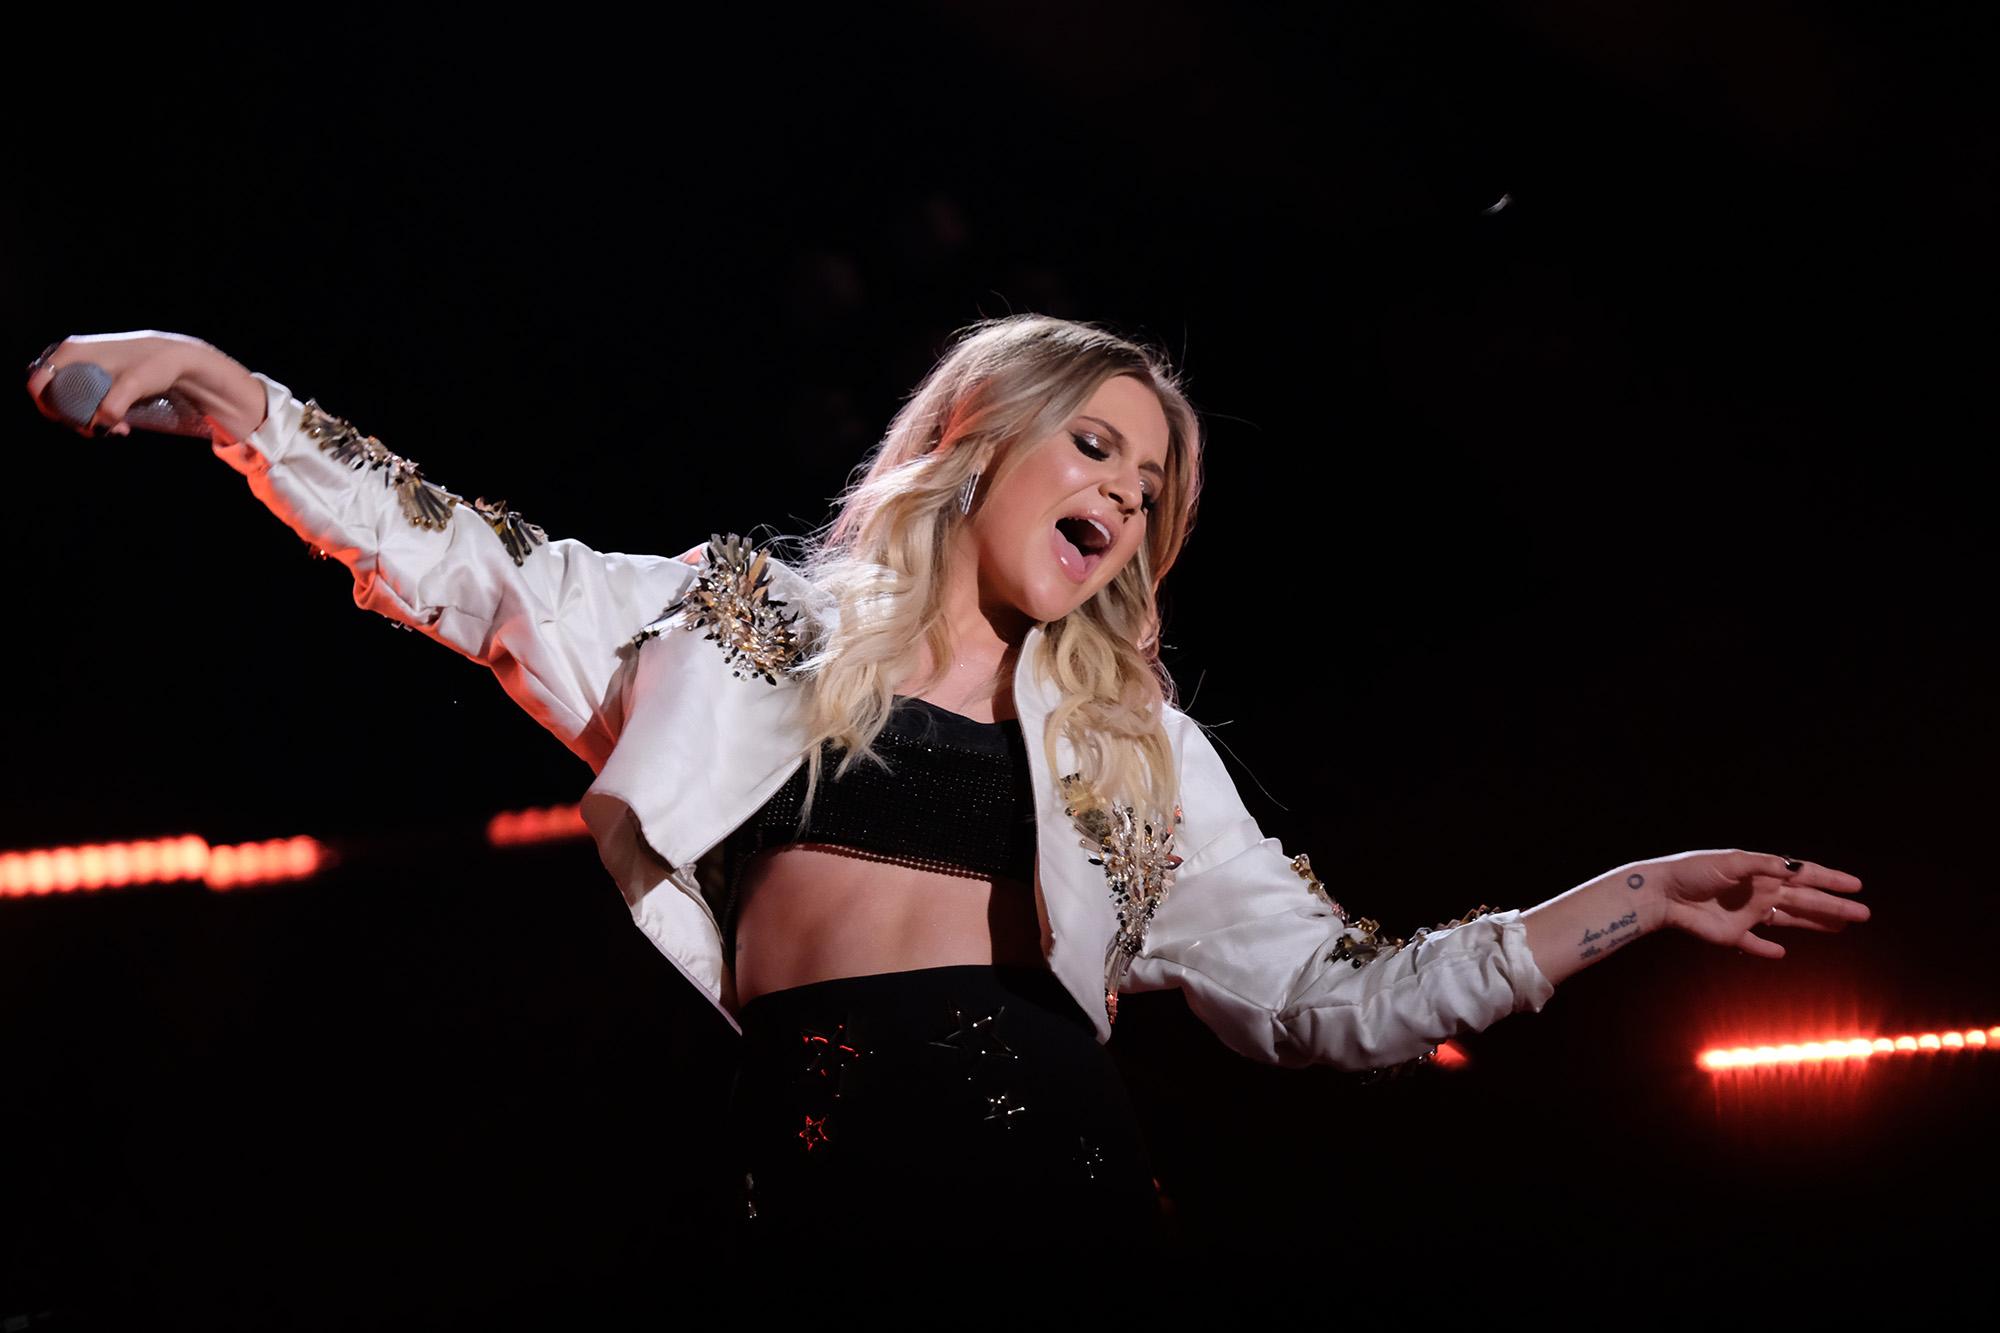 Kelsea Ballerini S Quot Dibs Quot Earns Platinum Status In The